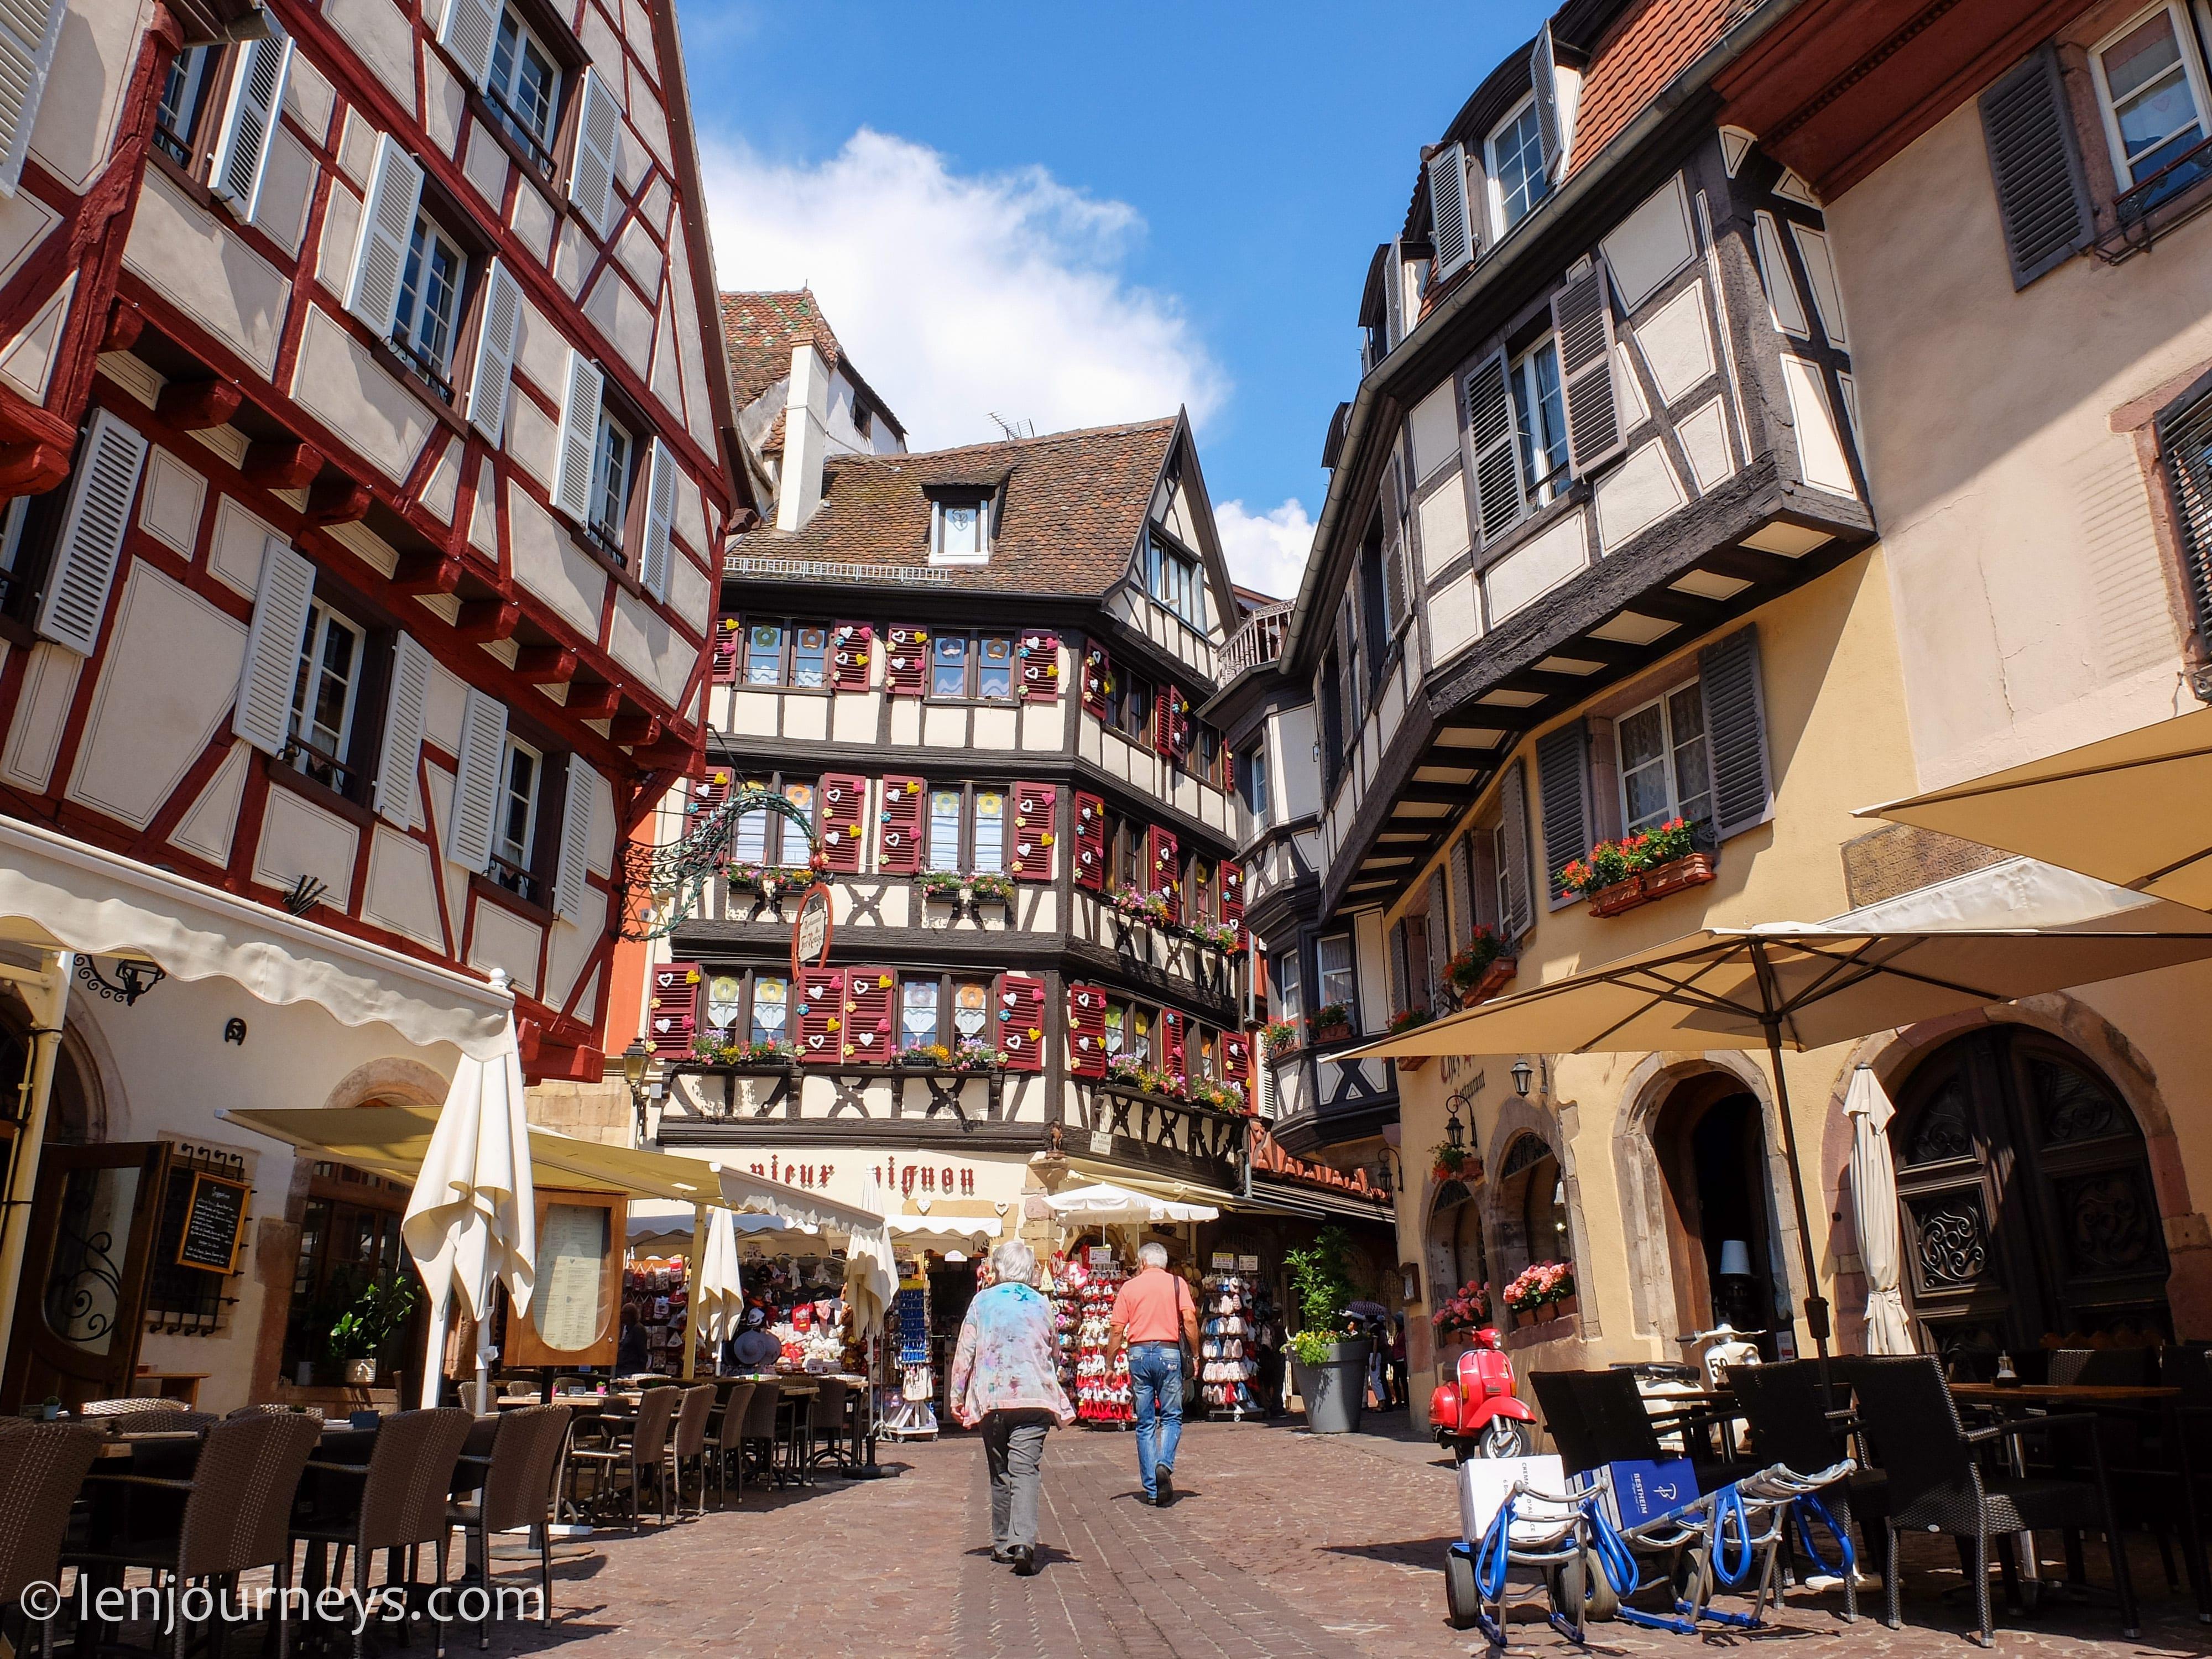 Colmar townscape